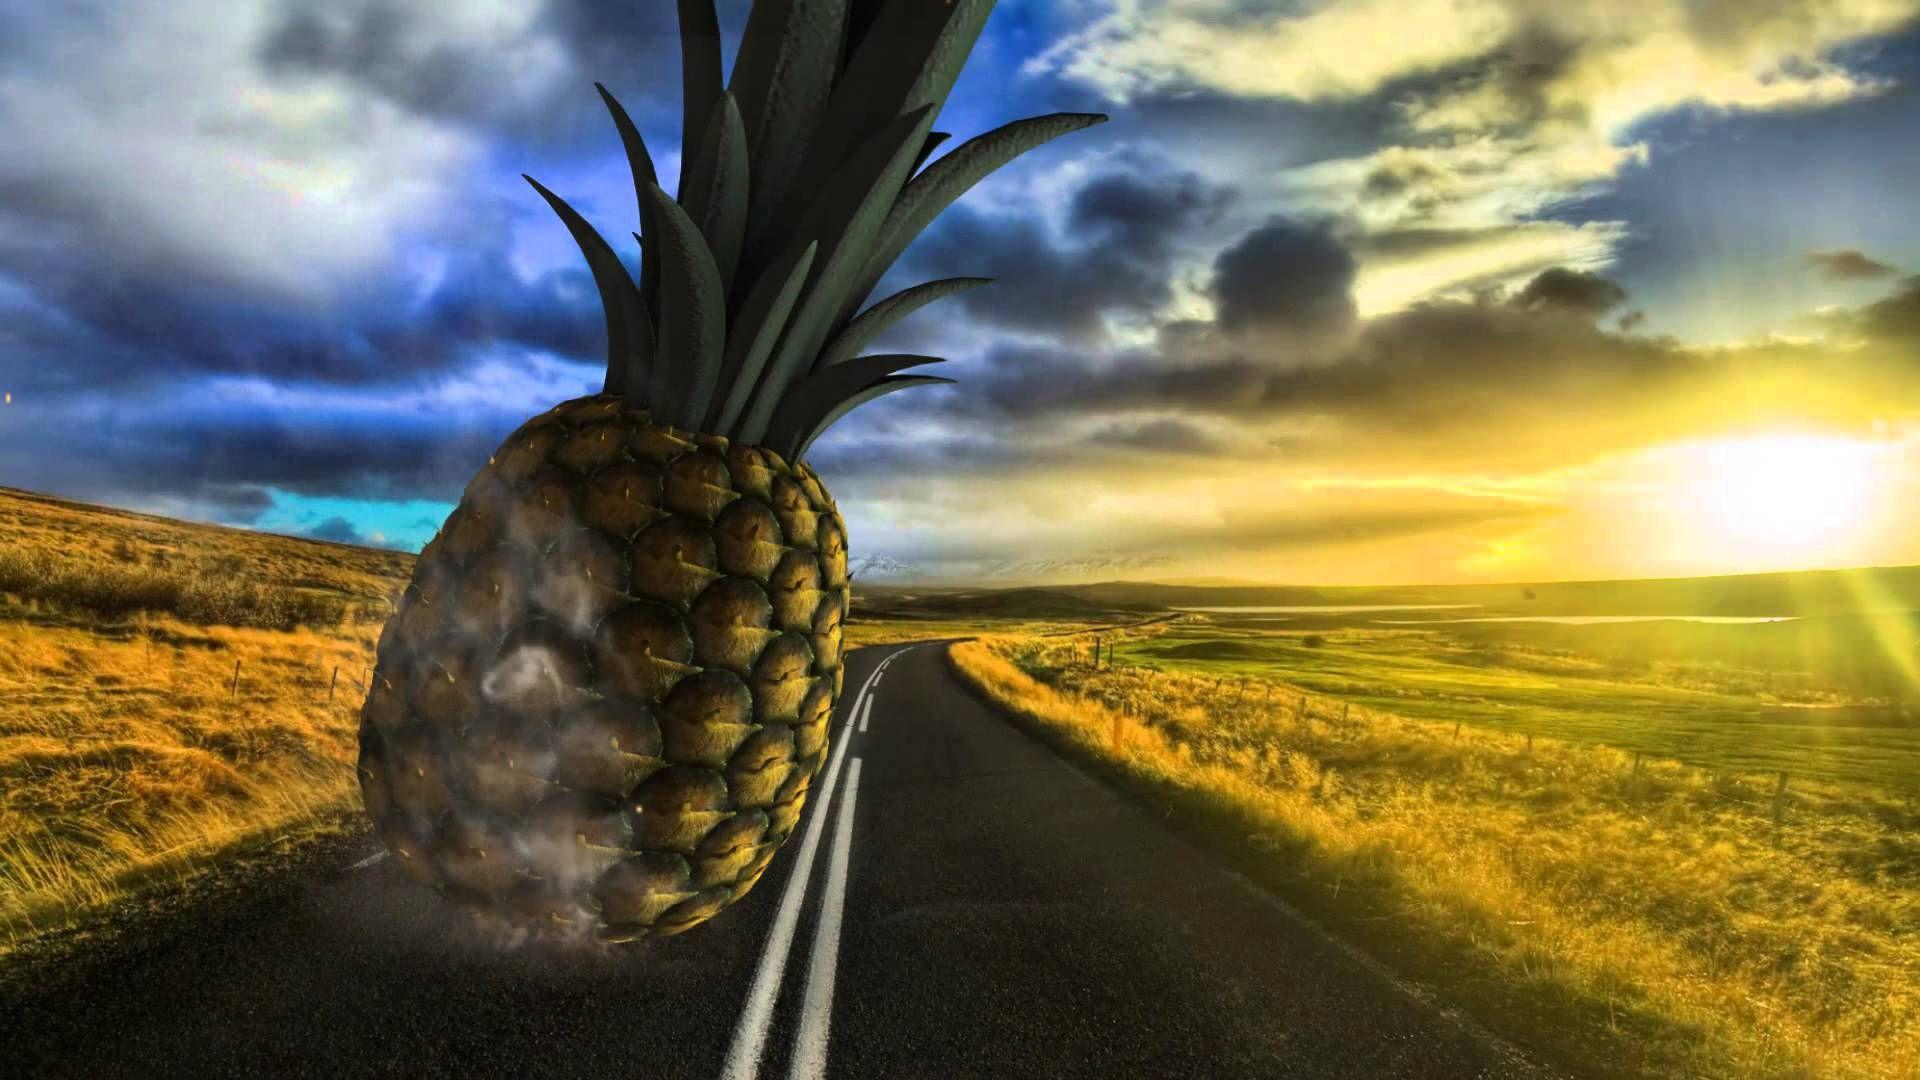 Download full hd pineapple hd wallpaper